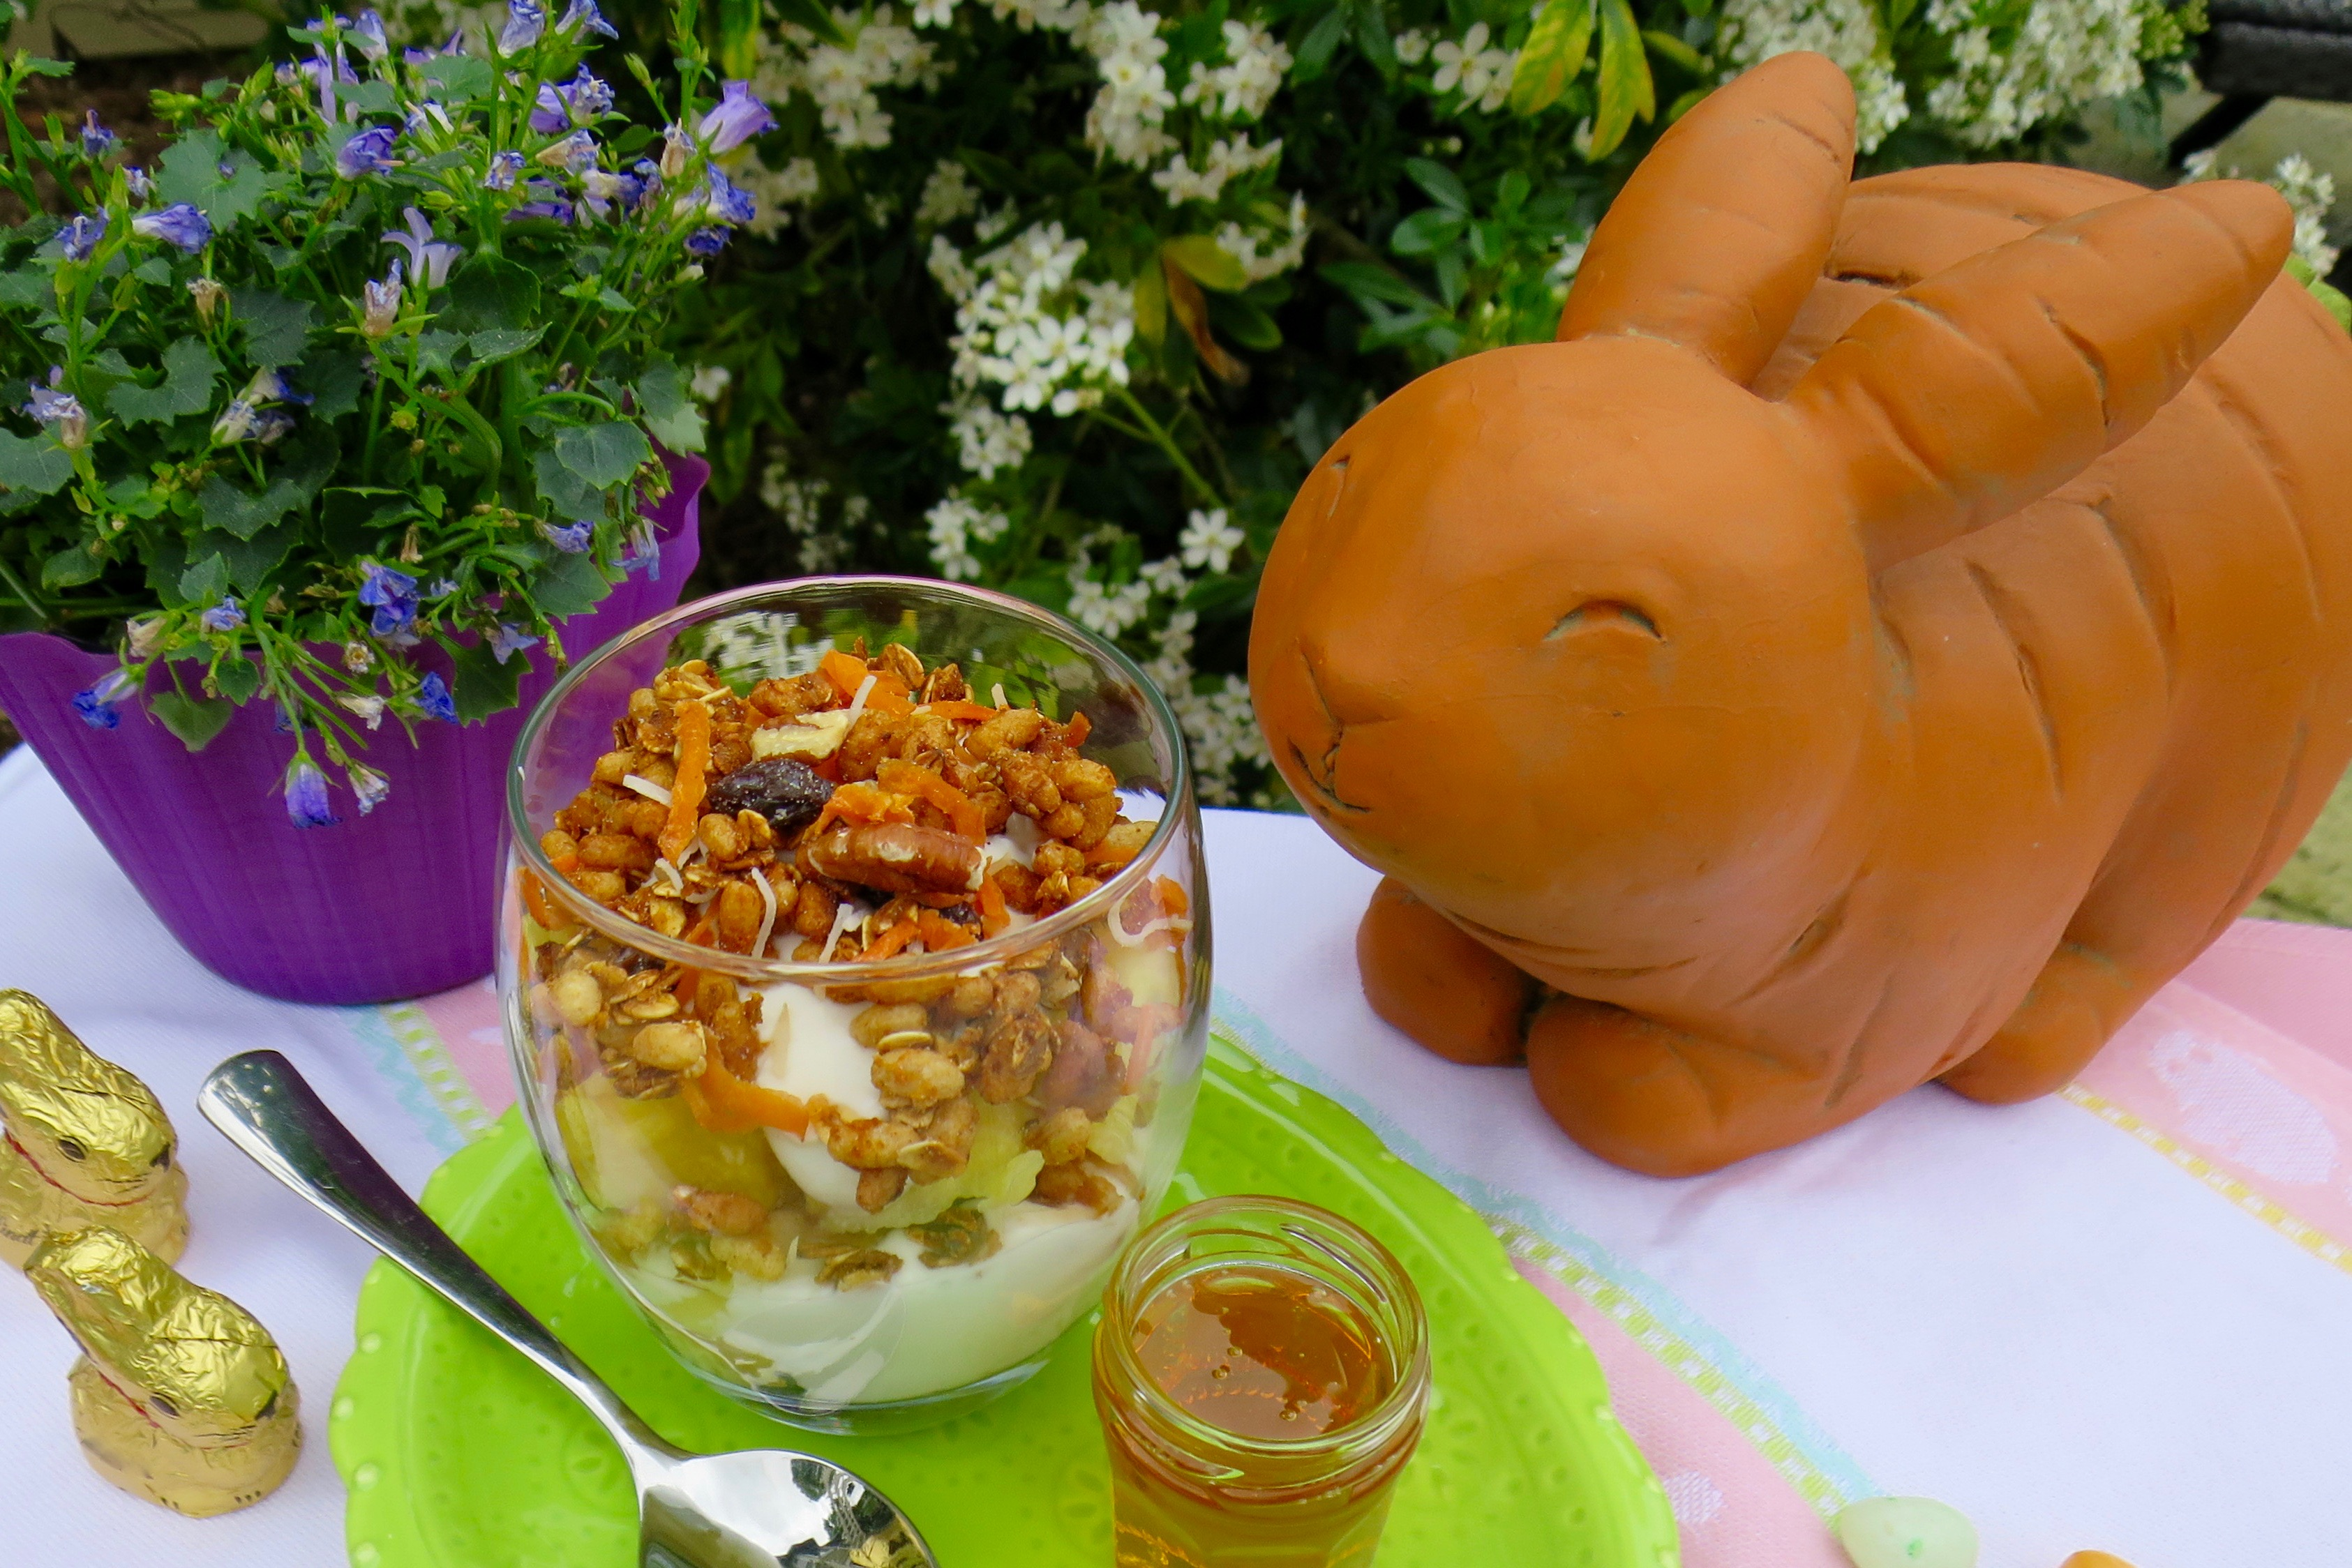 IMG_6272Carrot Cake Granola, Fruit & Yogurt Parfaits